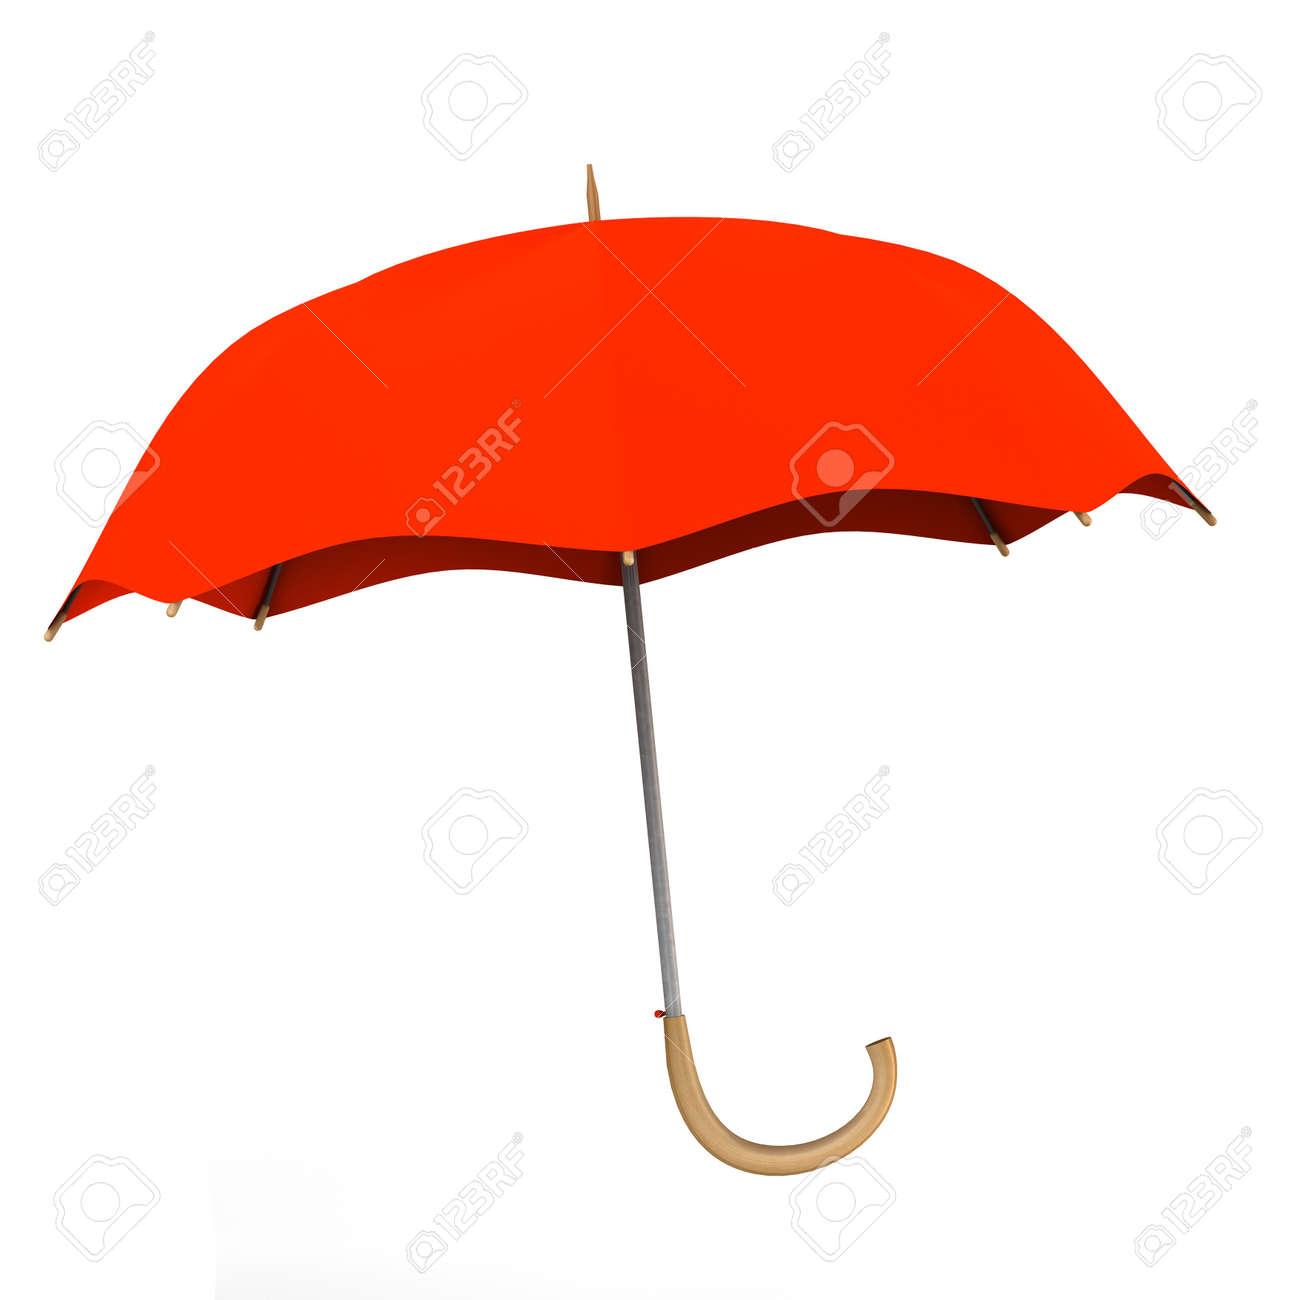 Red umbrella on white background Stock Photo - 14571494